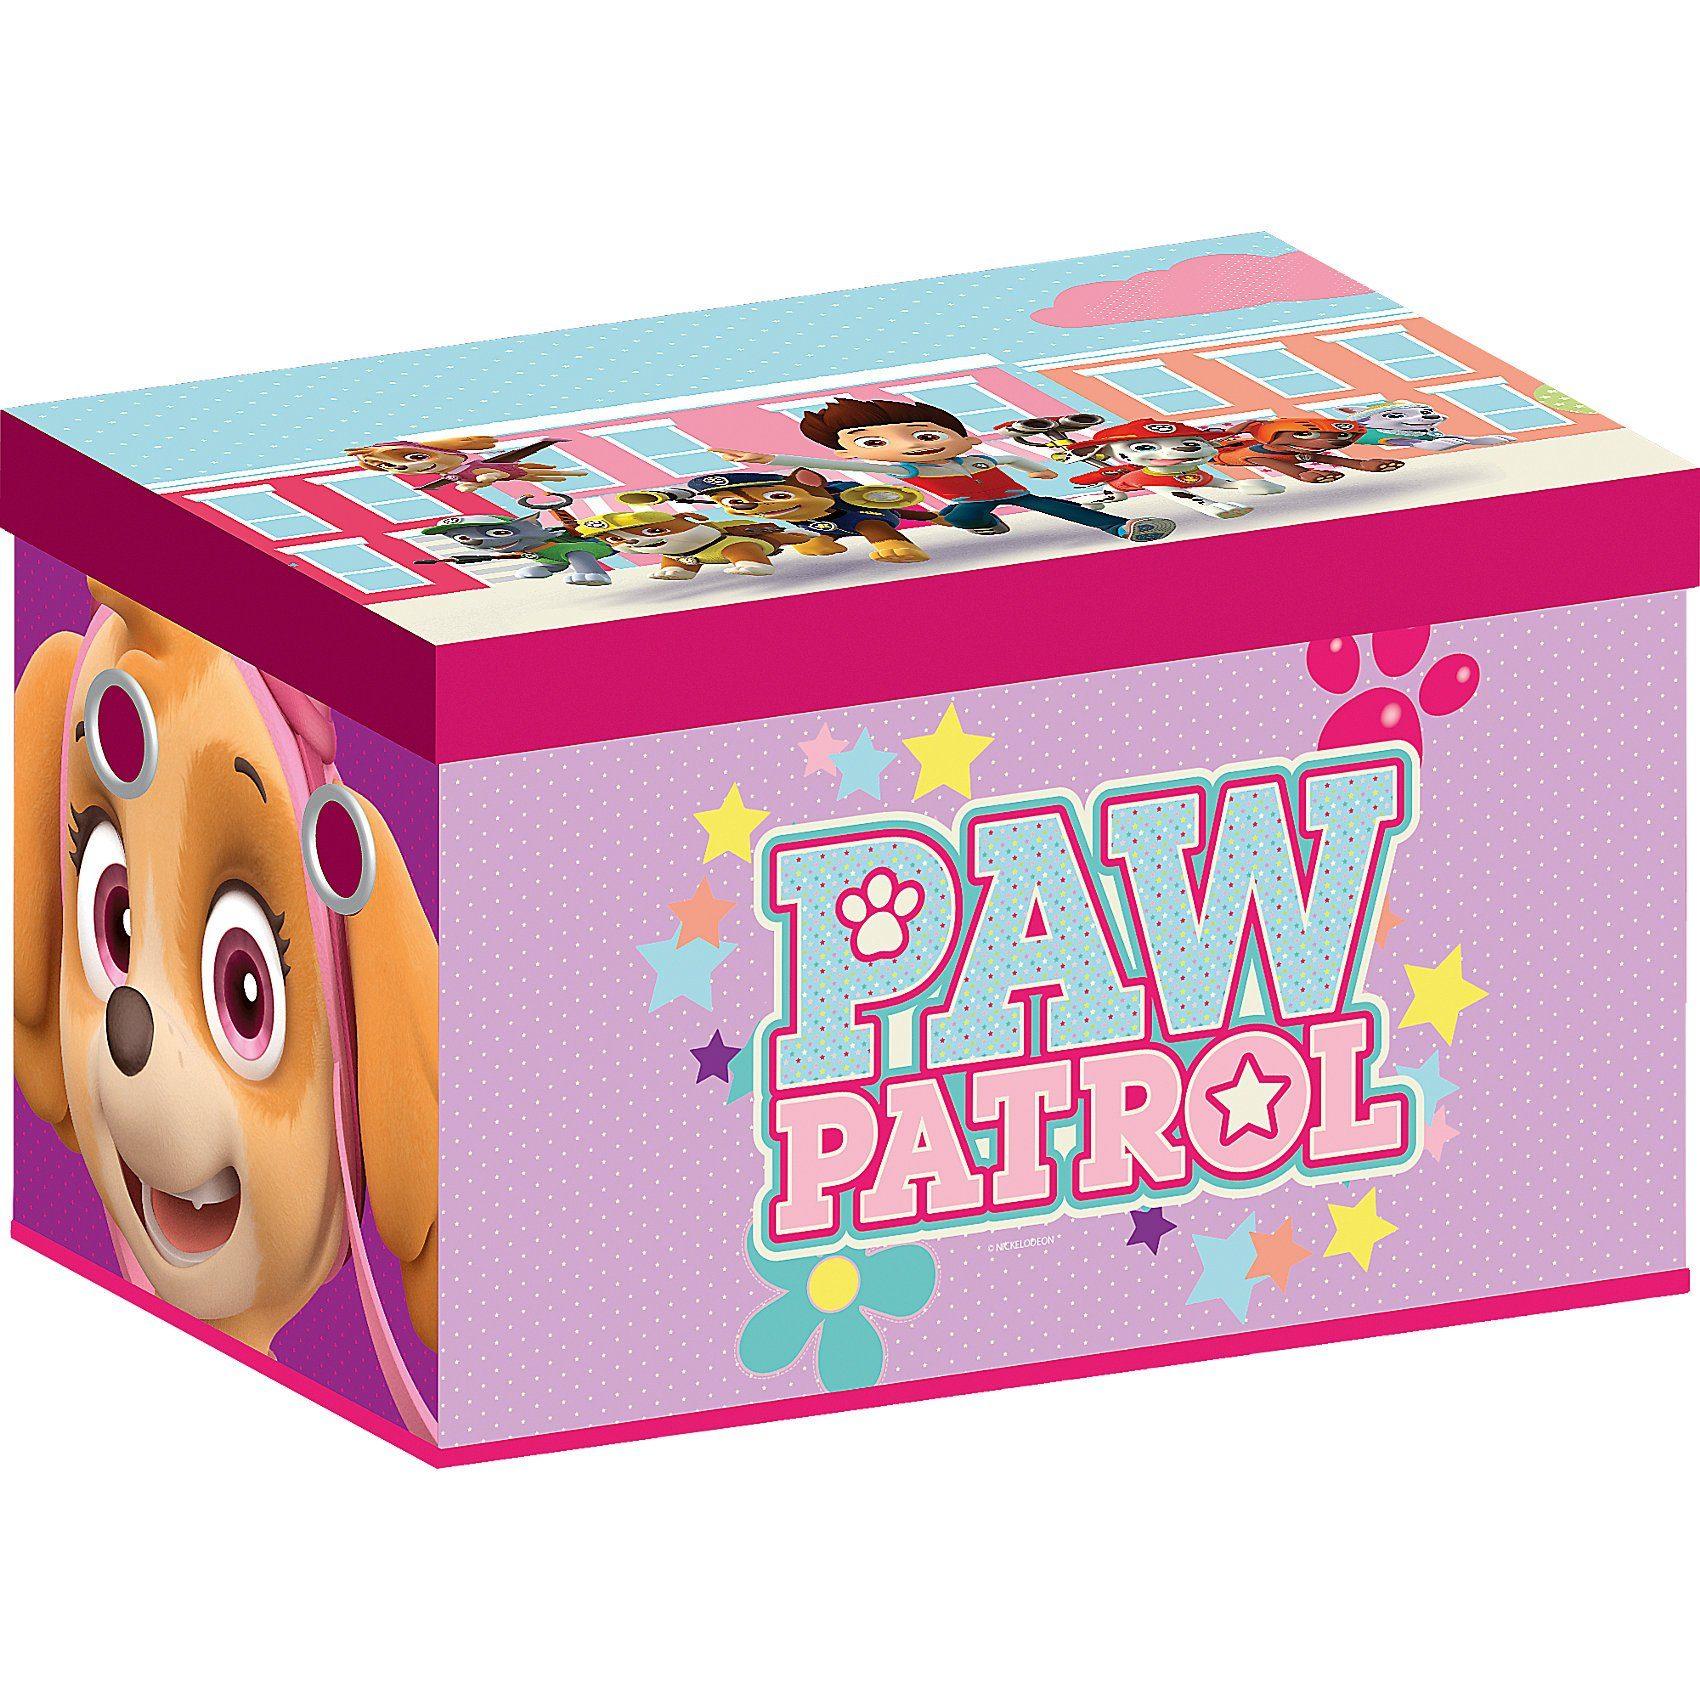 Aufbewahrungsbox, Paw Patrol Girl